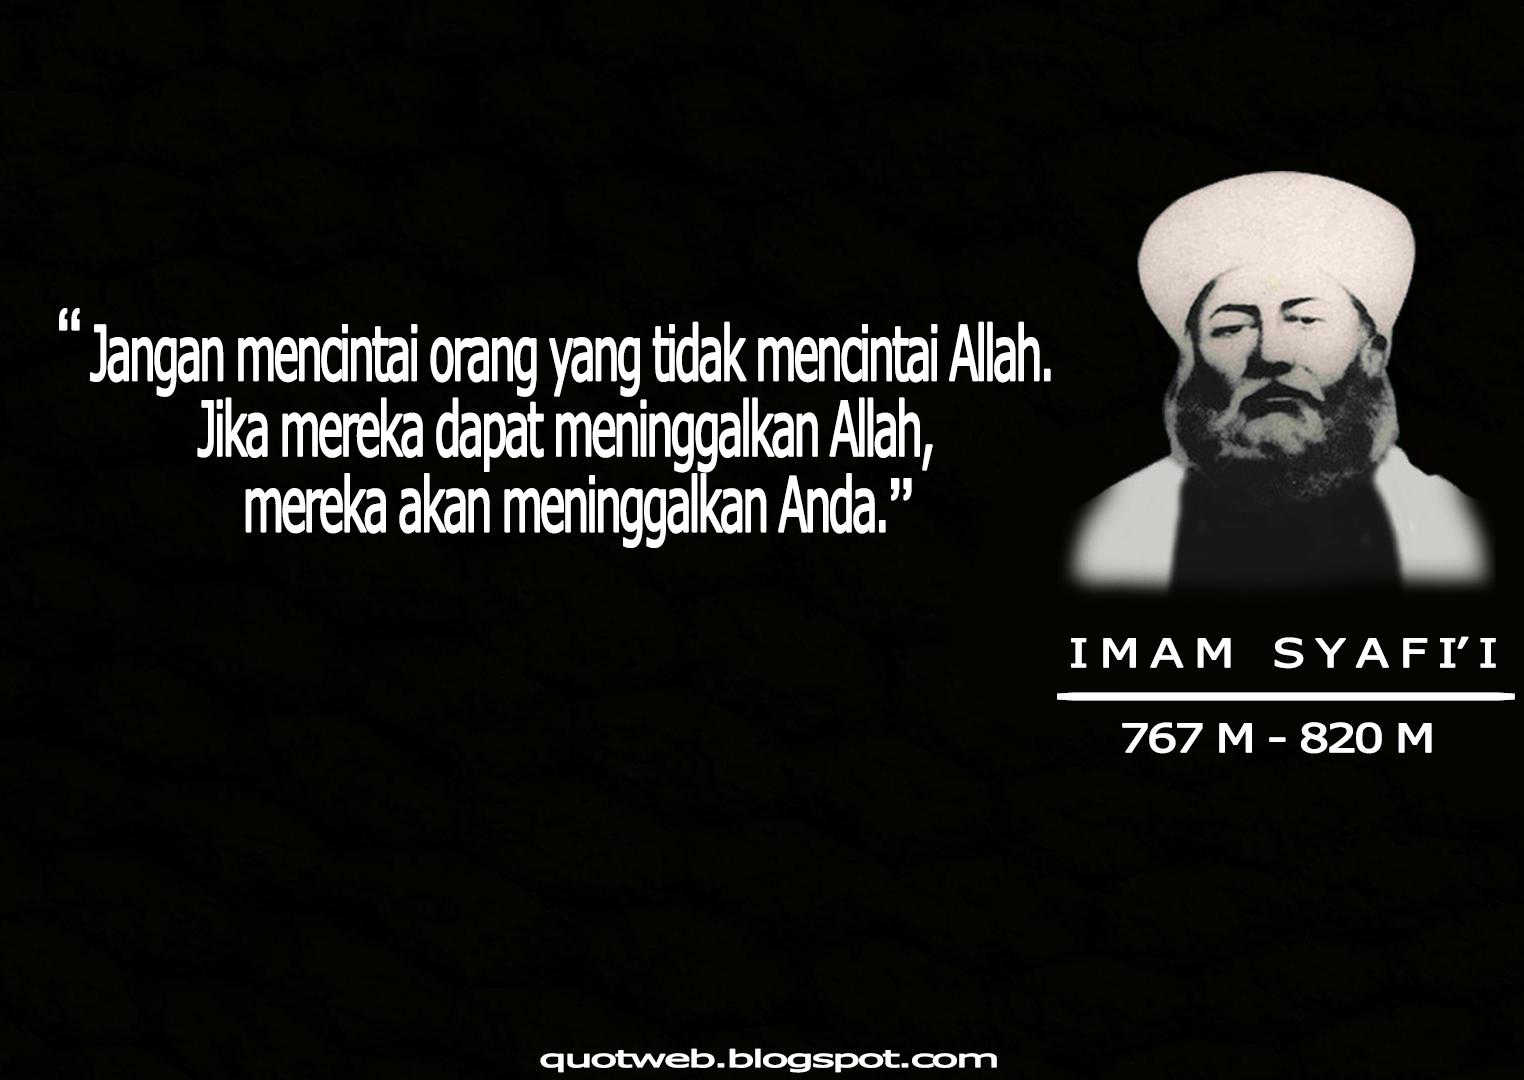 Kumpulan Kata Bijak Imam Syafi I Quotweb